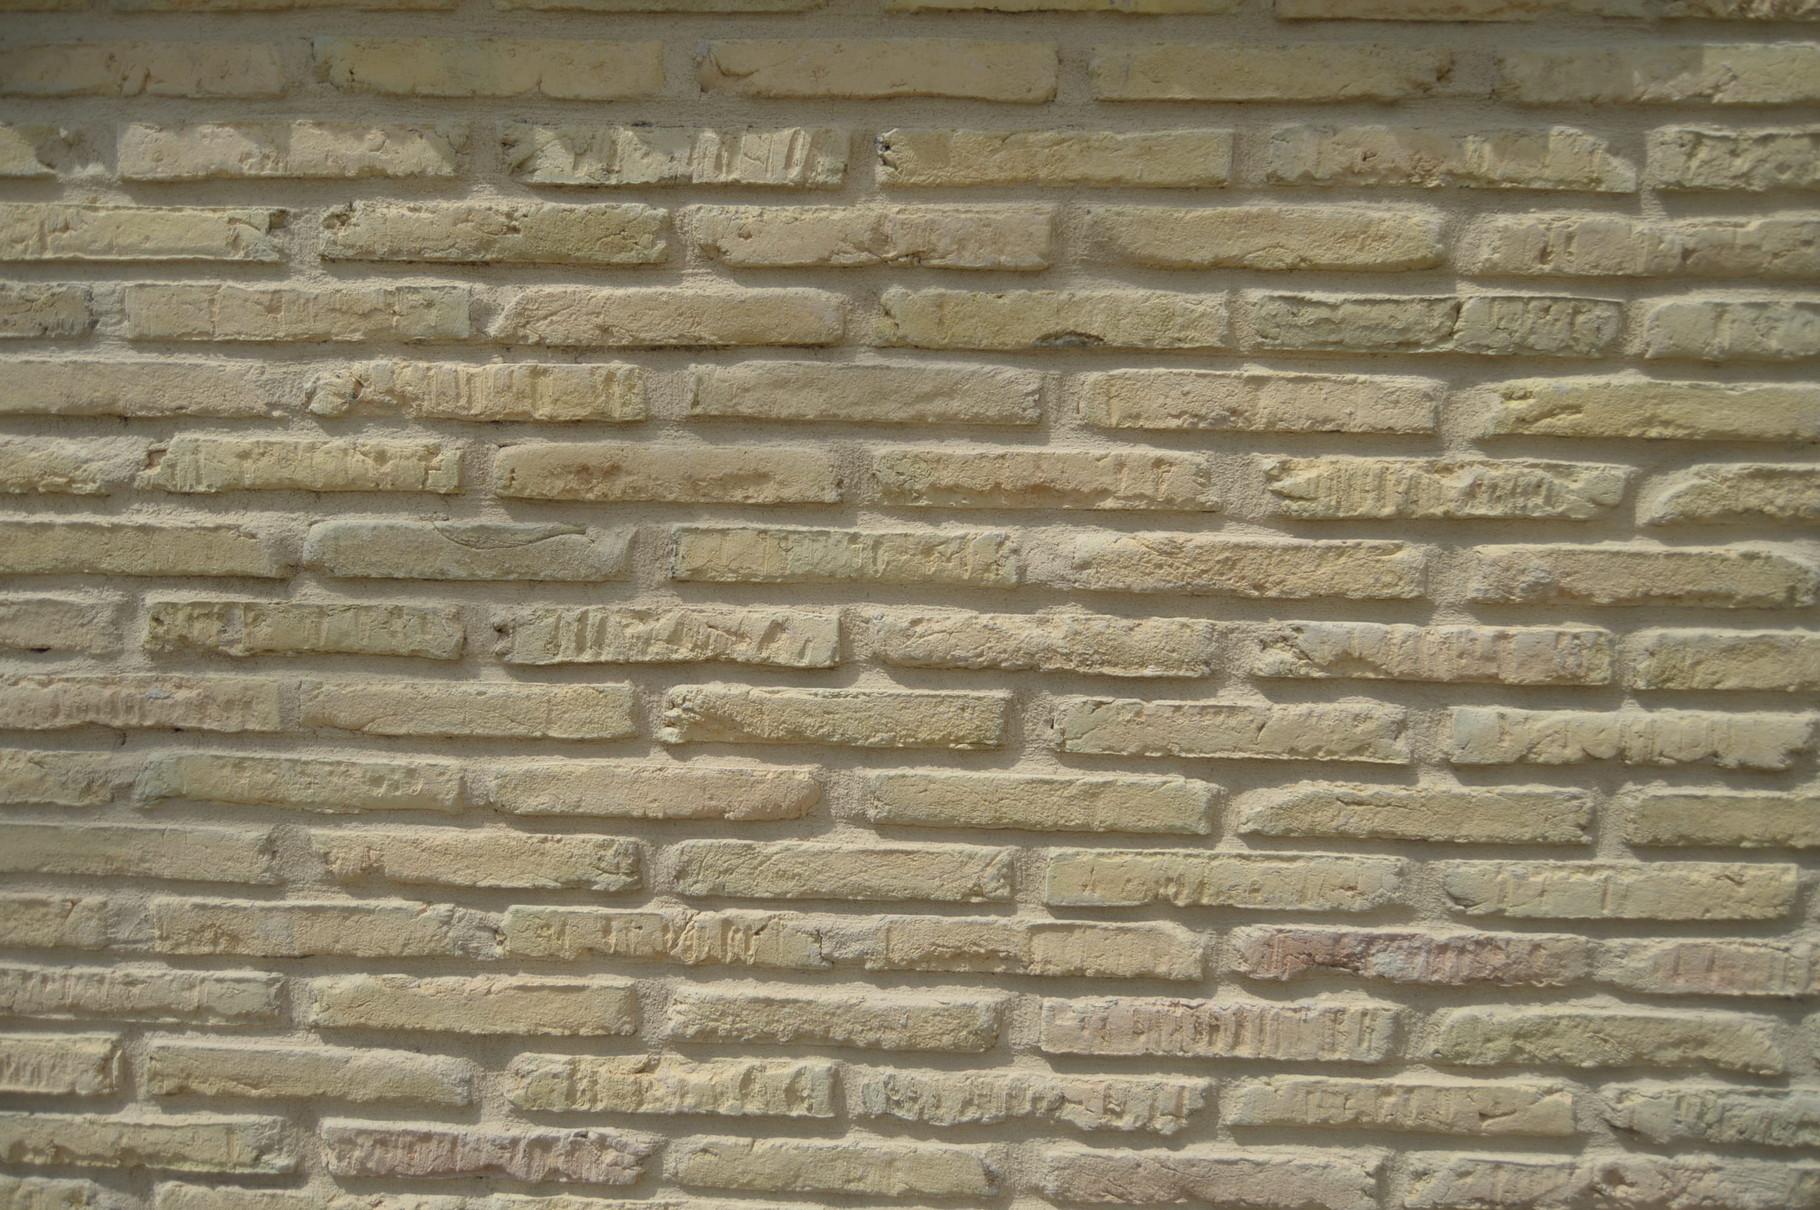 Ladrillo rustico galeria de fotos r sticos zorzano - Ladrillo visto rustico ...